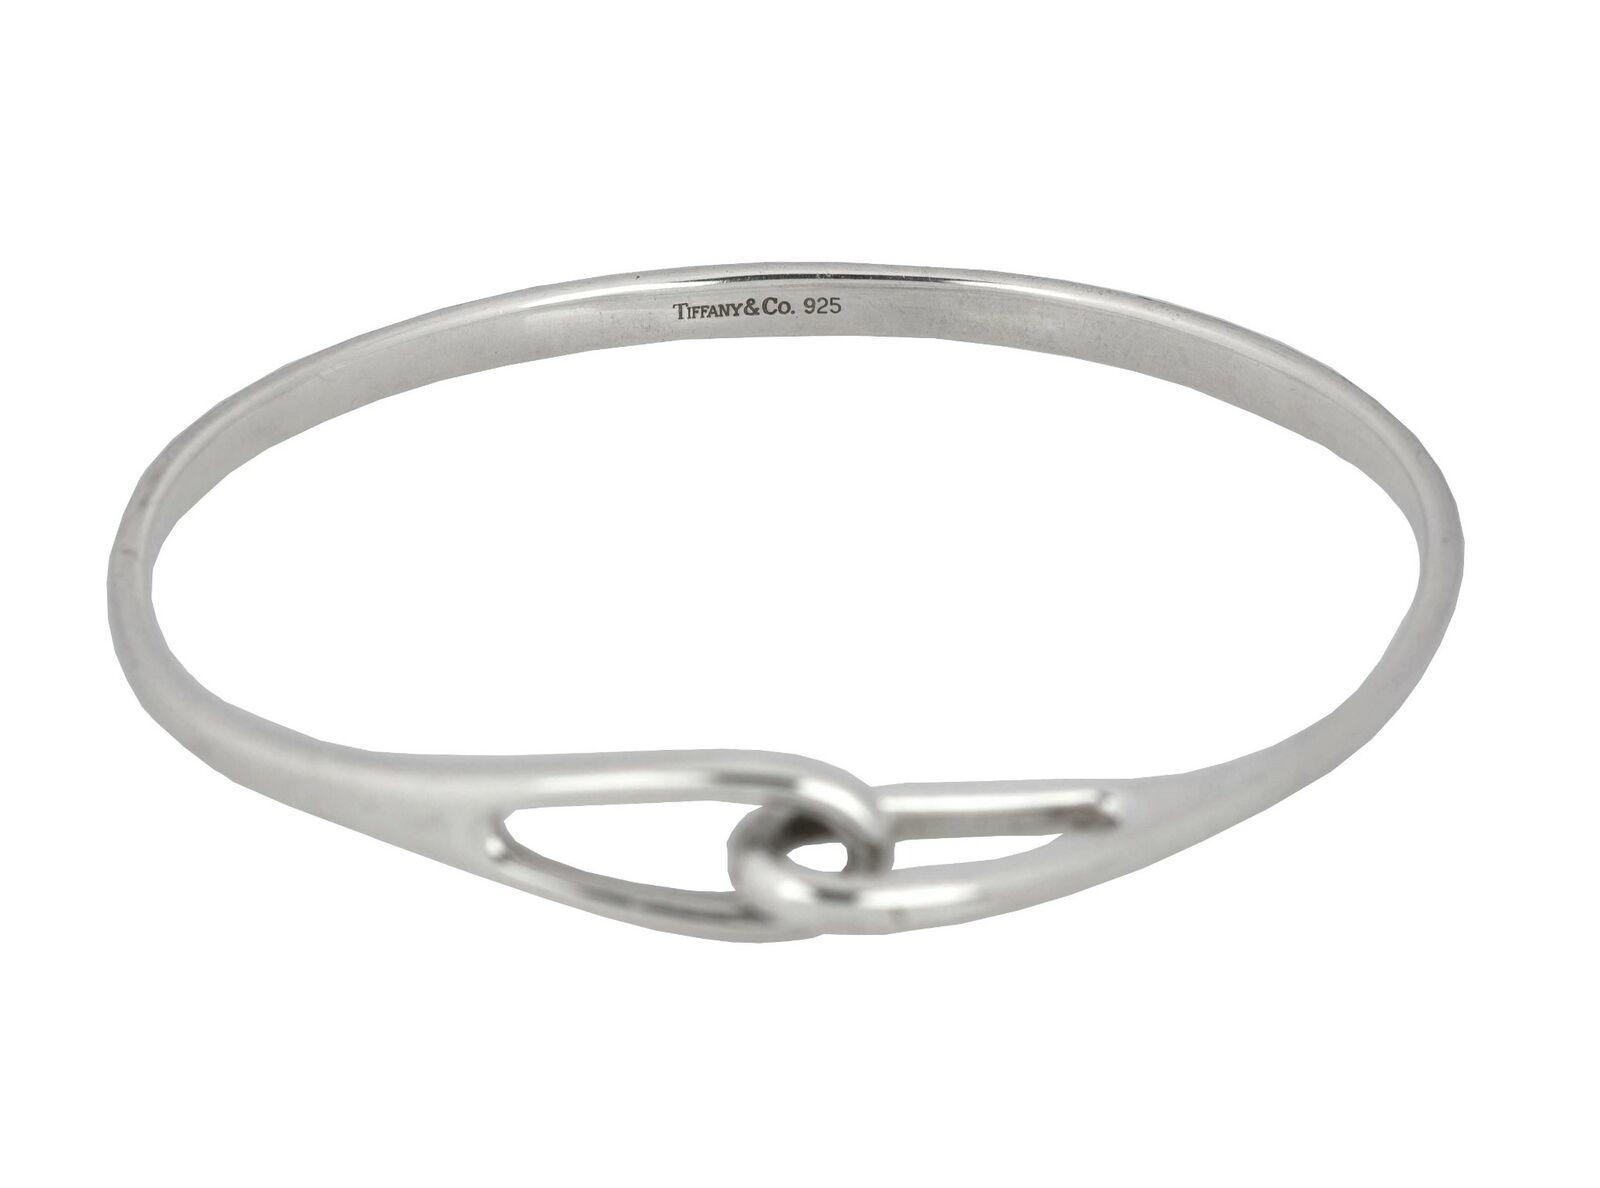 Retired Tiffany & Co. 925 Sterling Silver Interlocking Infinity Bangle Bracelet